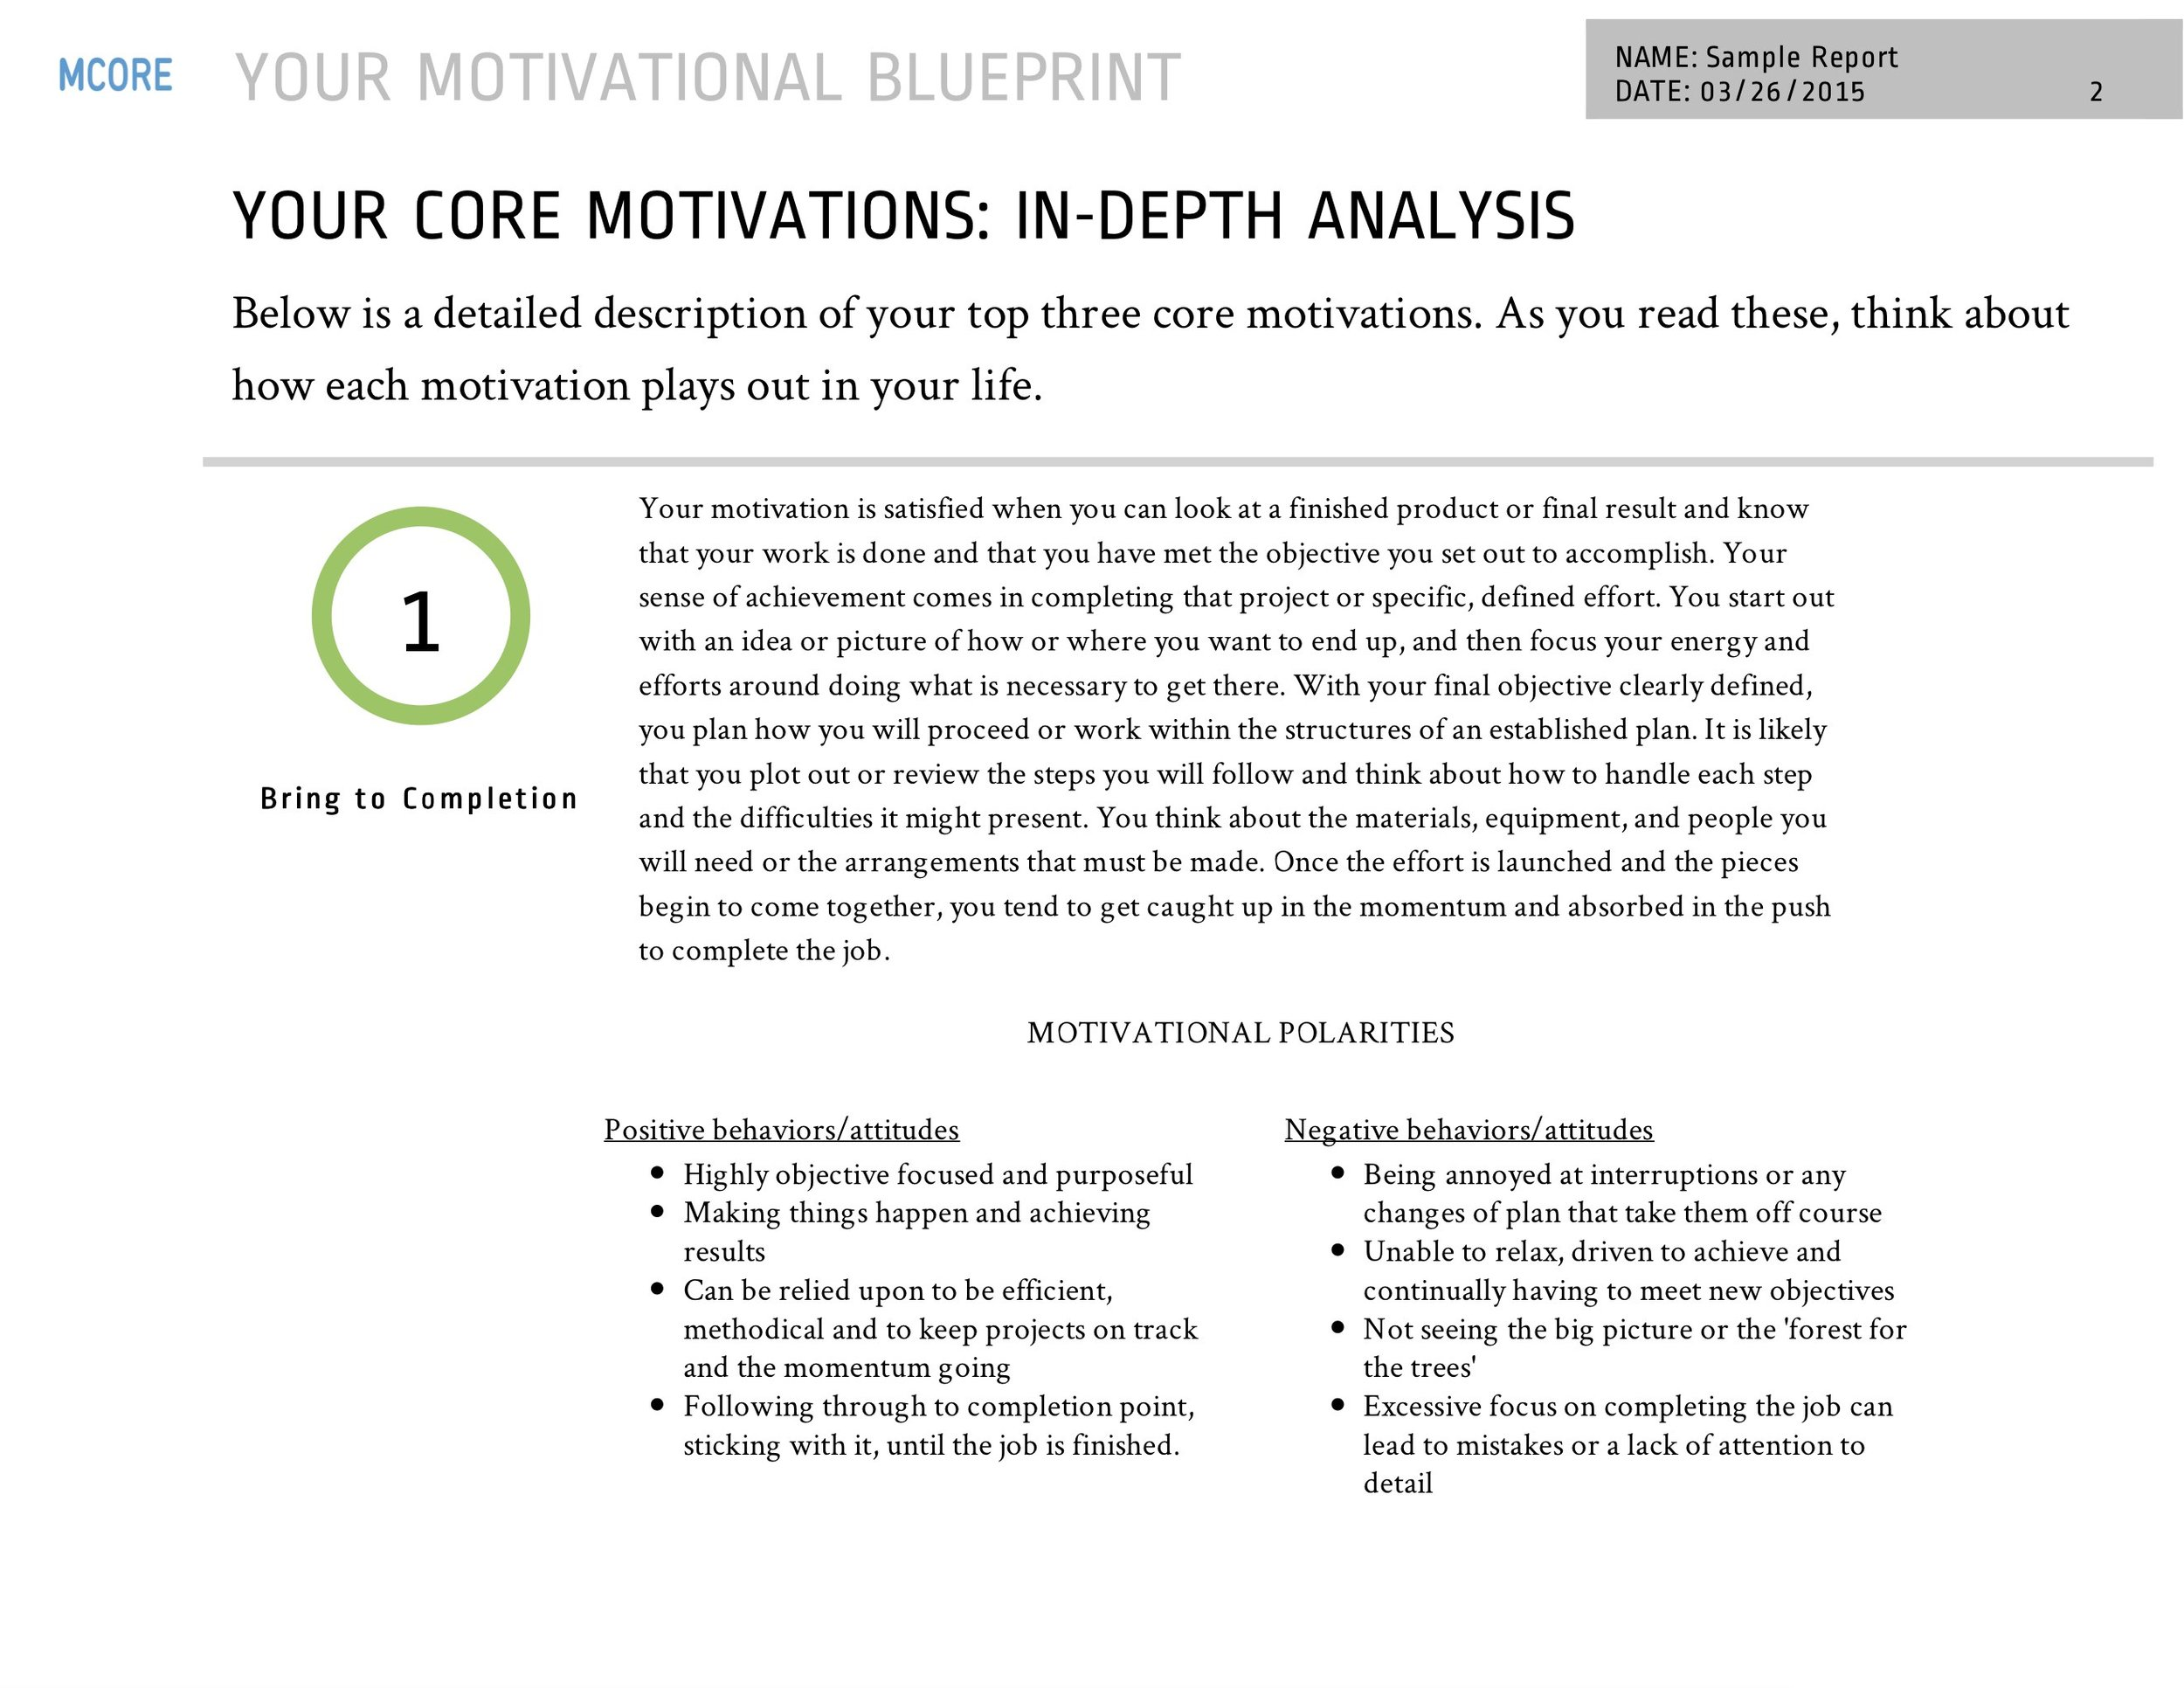 mcore-sample-report-story-solutions-02.jpg